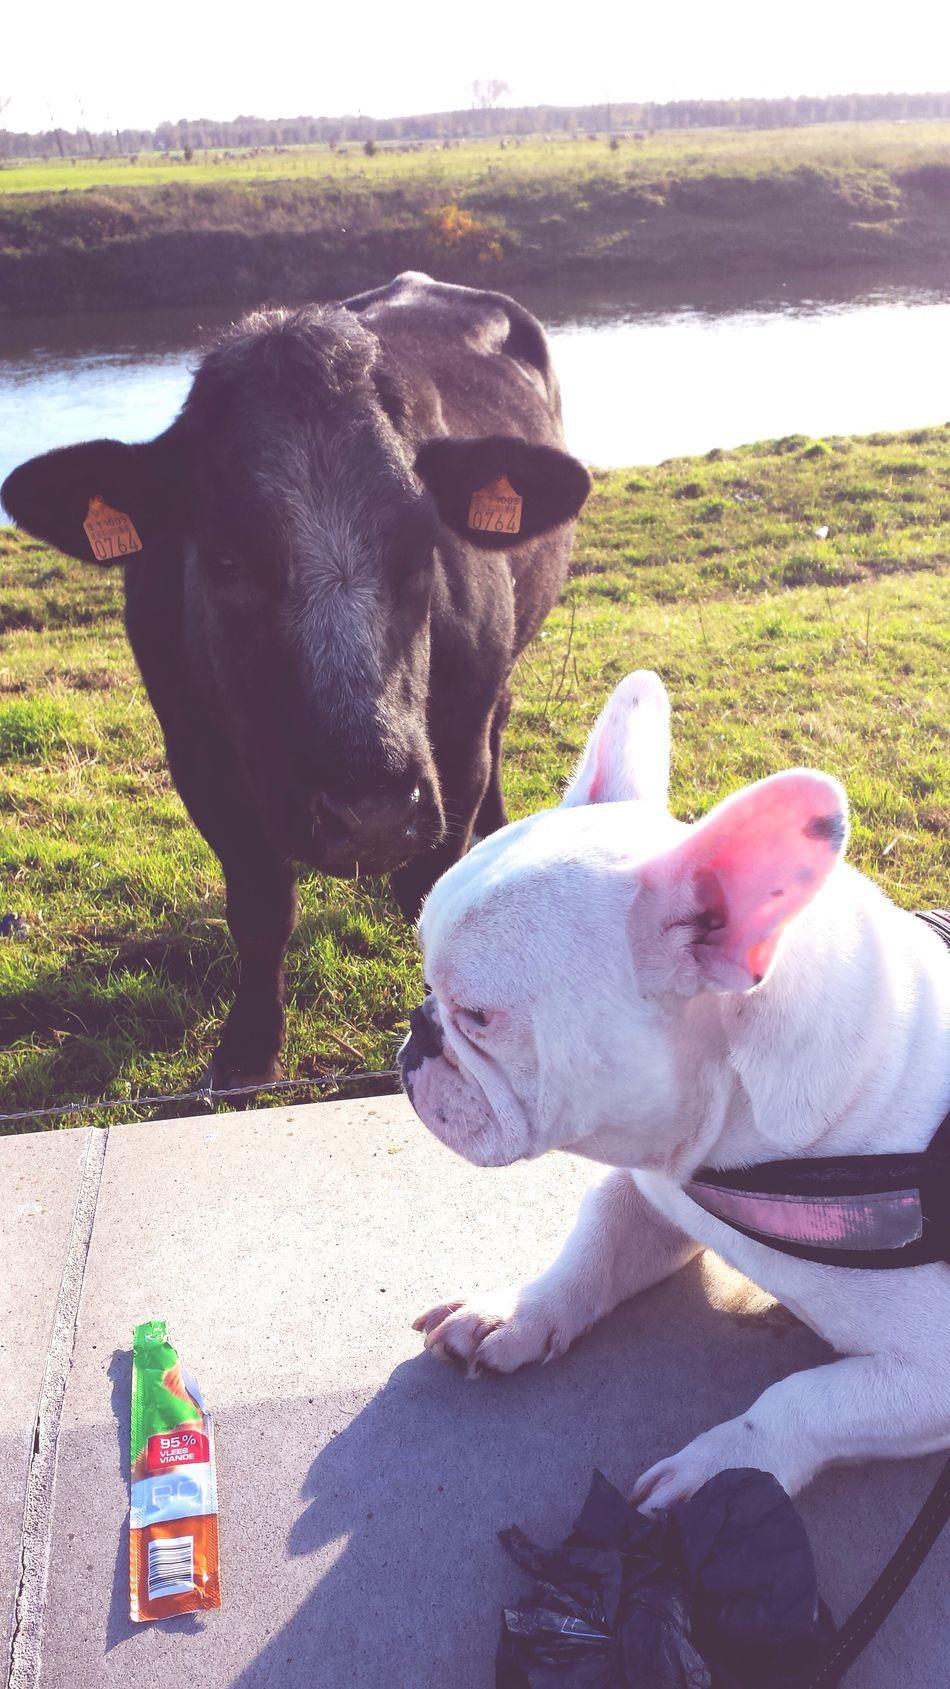 Belgium Maaseik Maas River Friends Bulldog Sunny Day Control